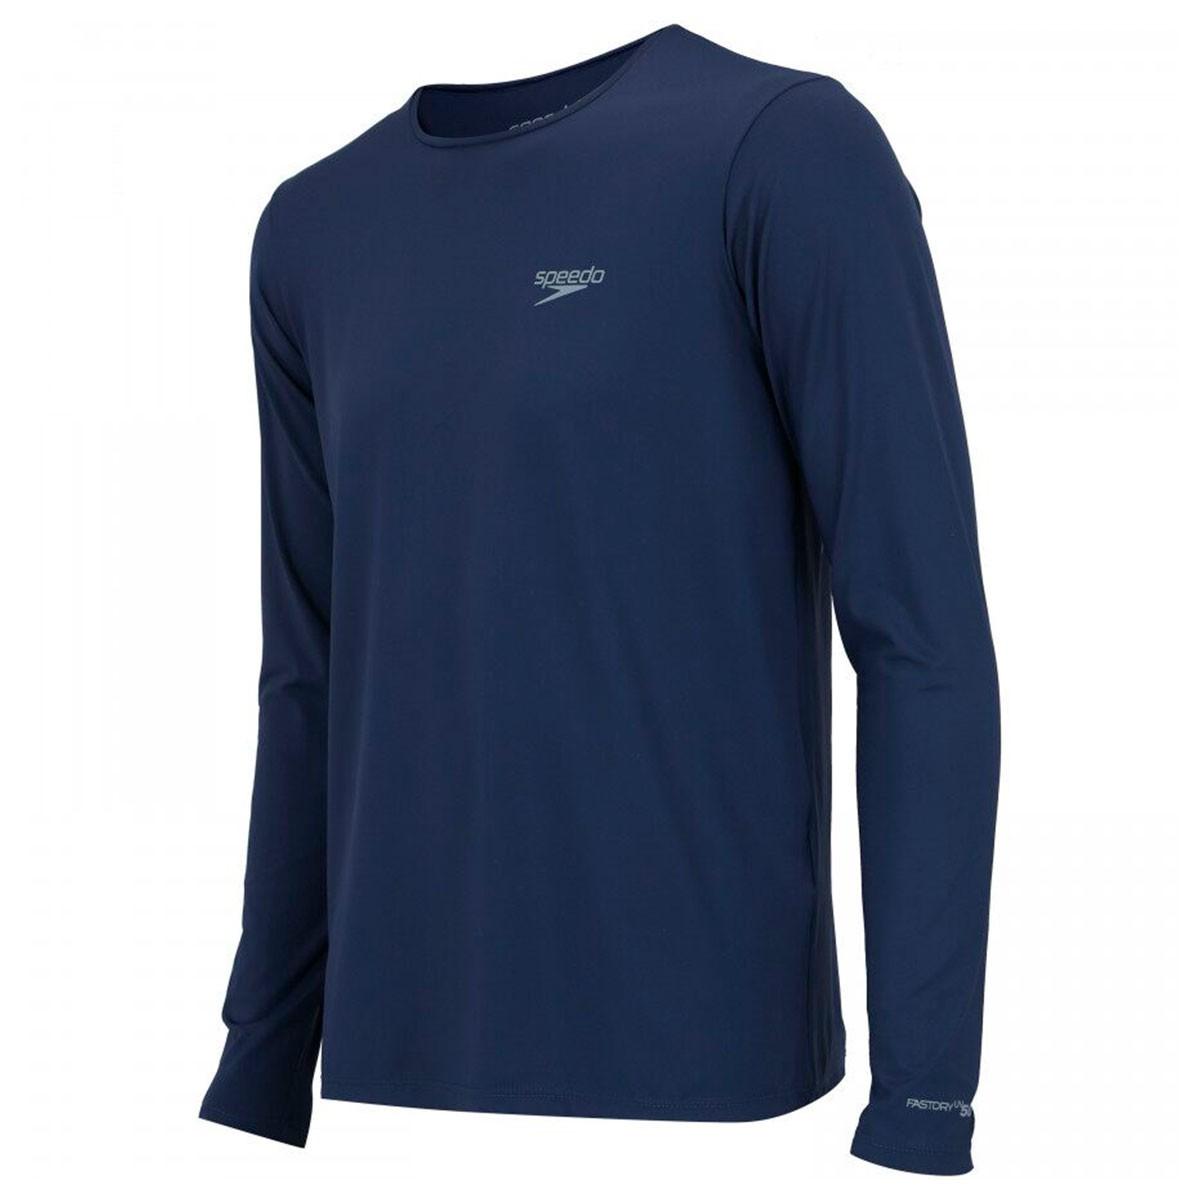 Camiseta Speedo UV Protection ML Masculino Marinho